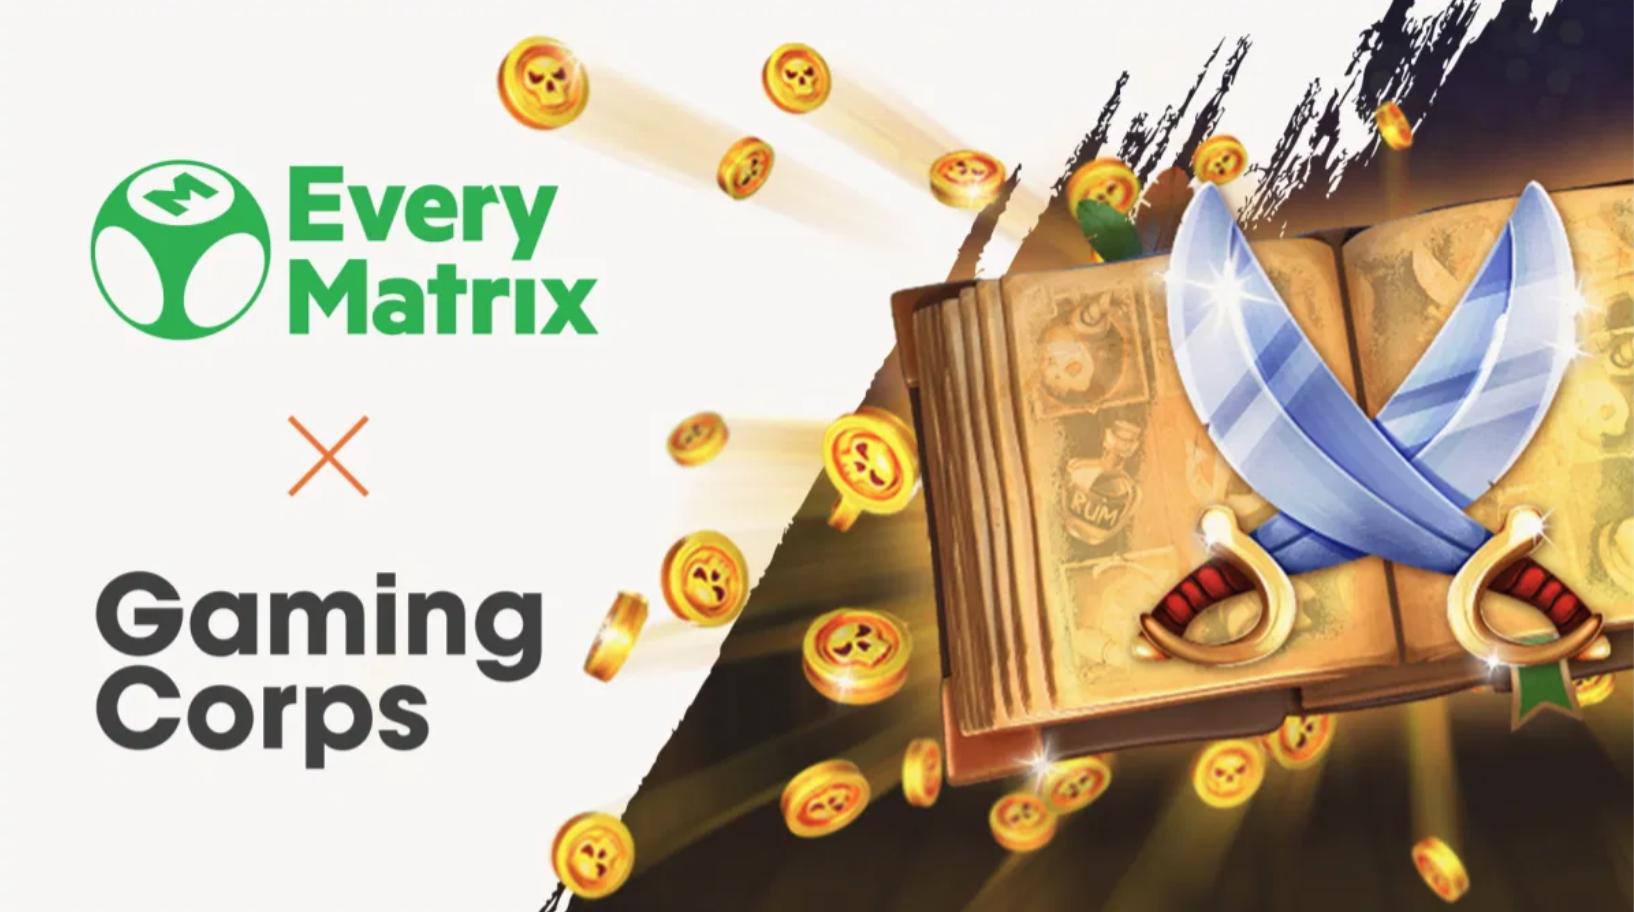 EveryMatrix 与 Gaming Crops 达成技术合作协议